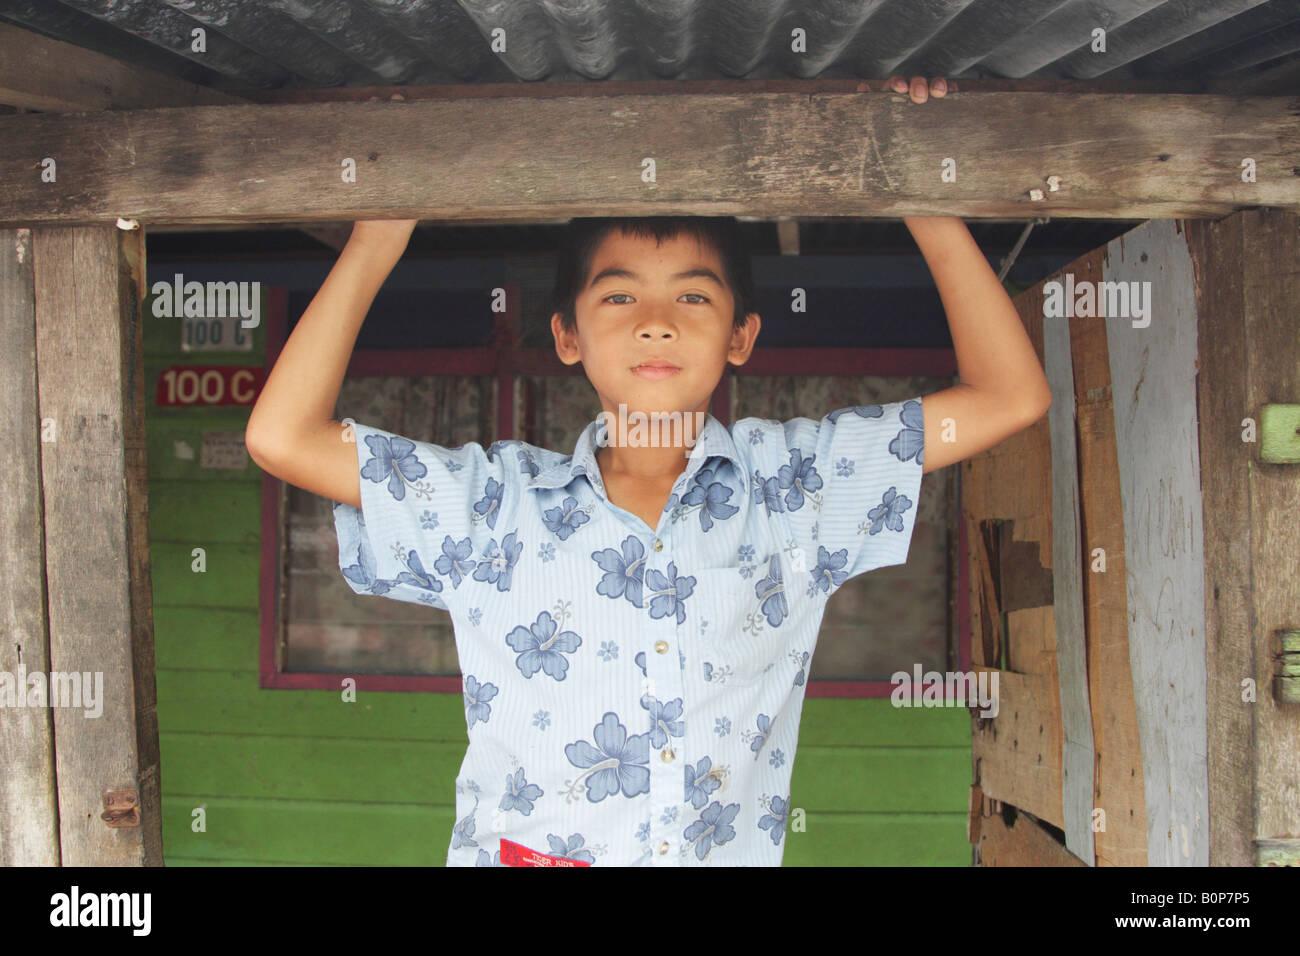 Local Boy From Stilt Village Of Kampung Ayer, Brunei - Stock Image